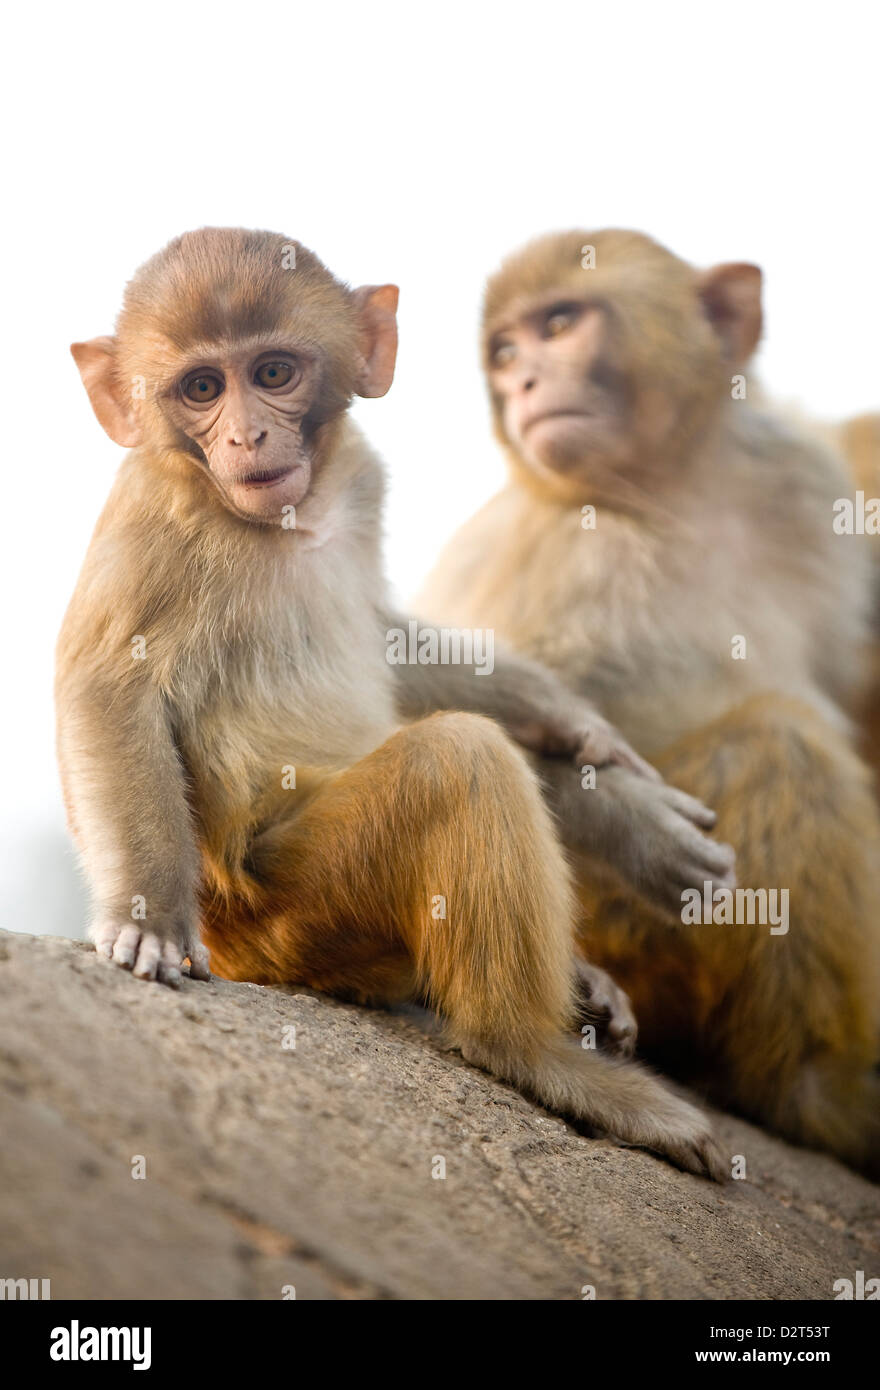 Le scimmie al tempio di Pashupatinath, Kathmandu, Nepal, Asia Immagini Stock